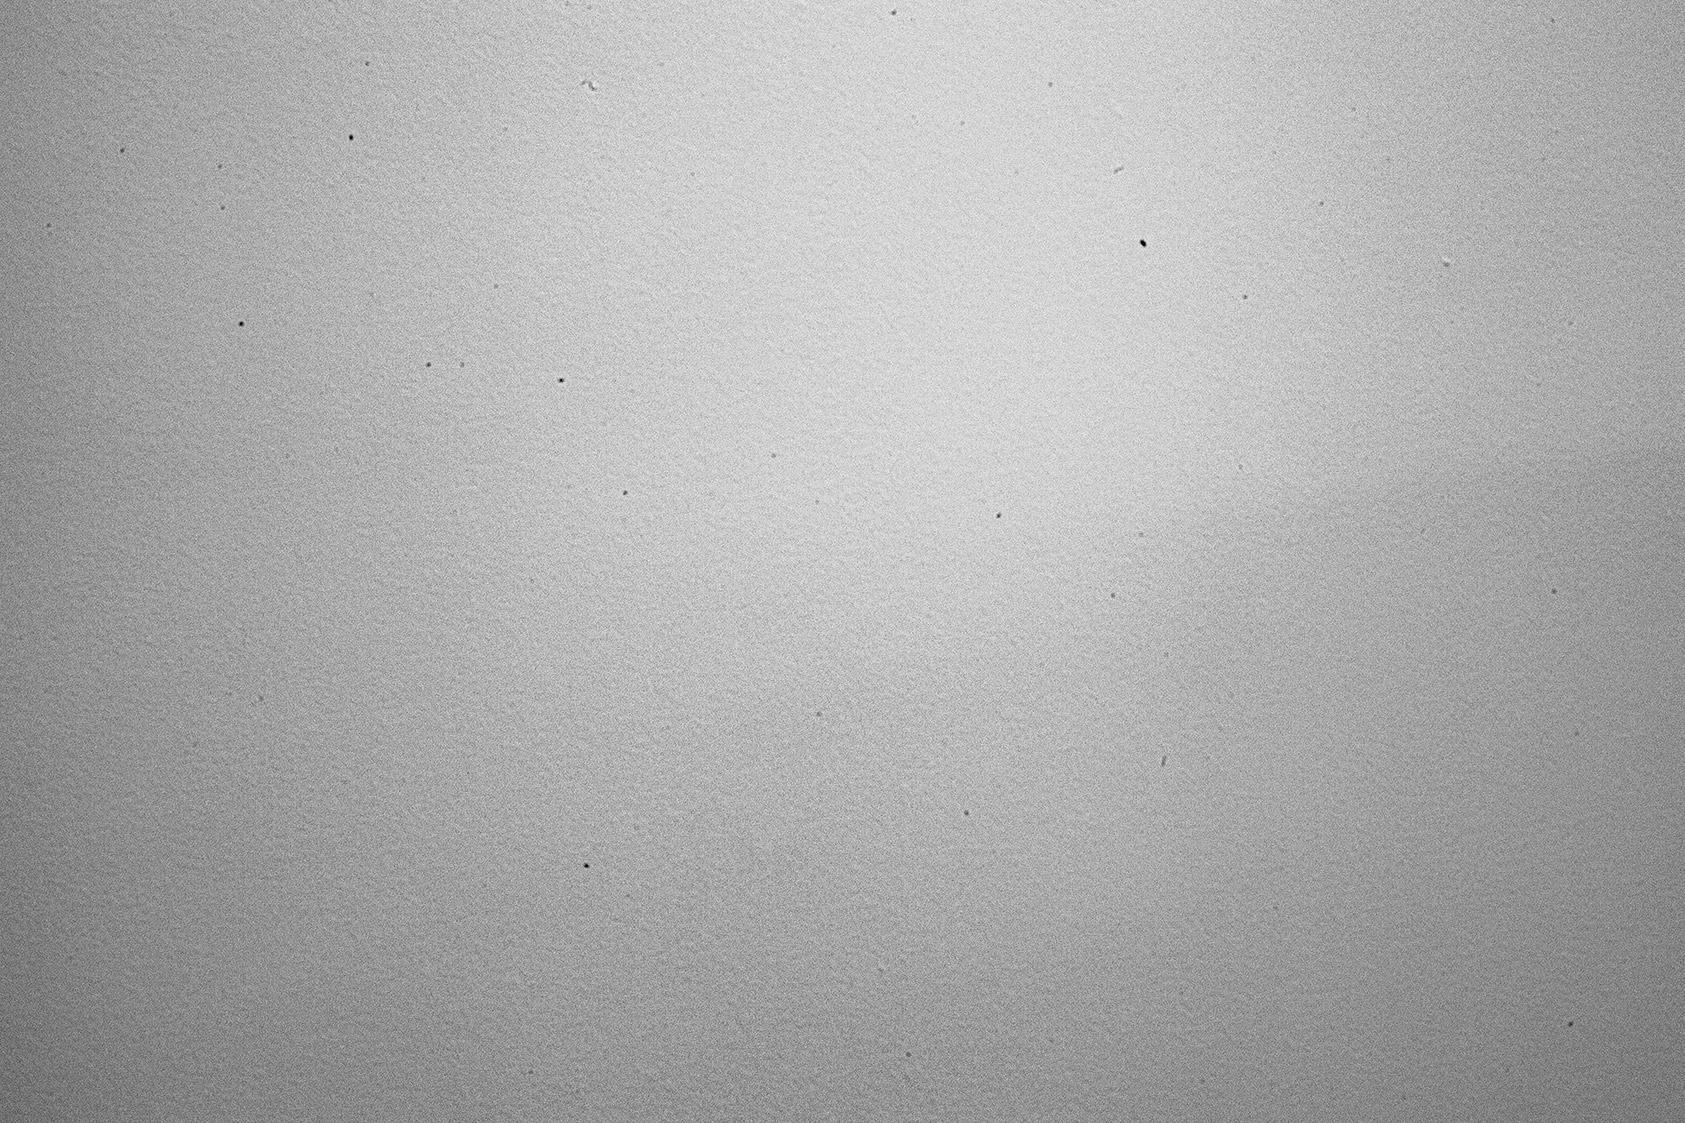 24-70mm canon lens showing sensor dust